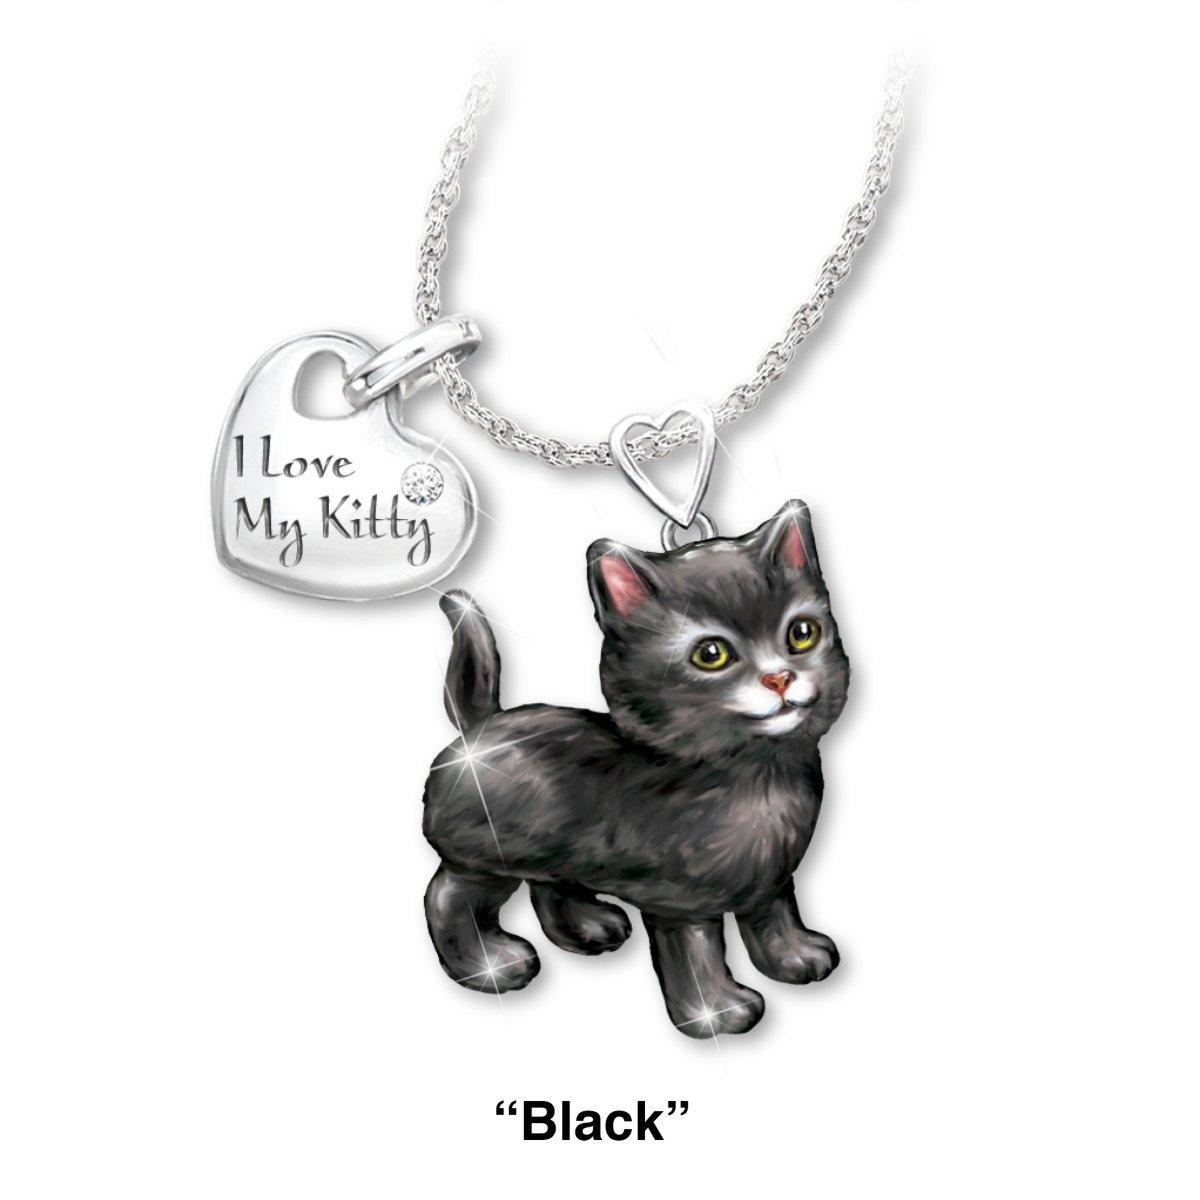 I Love My Kitten Cat Pendant Necklace